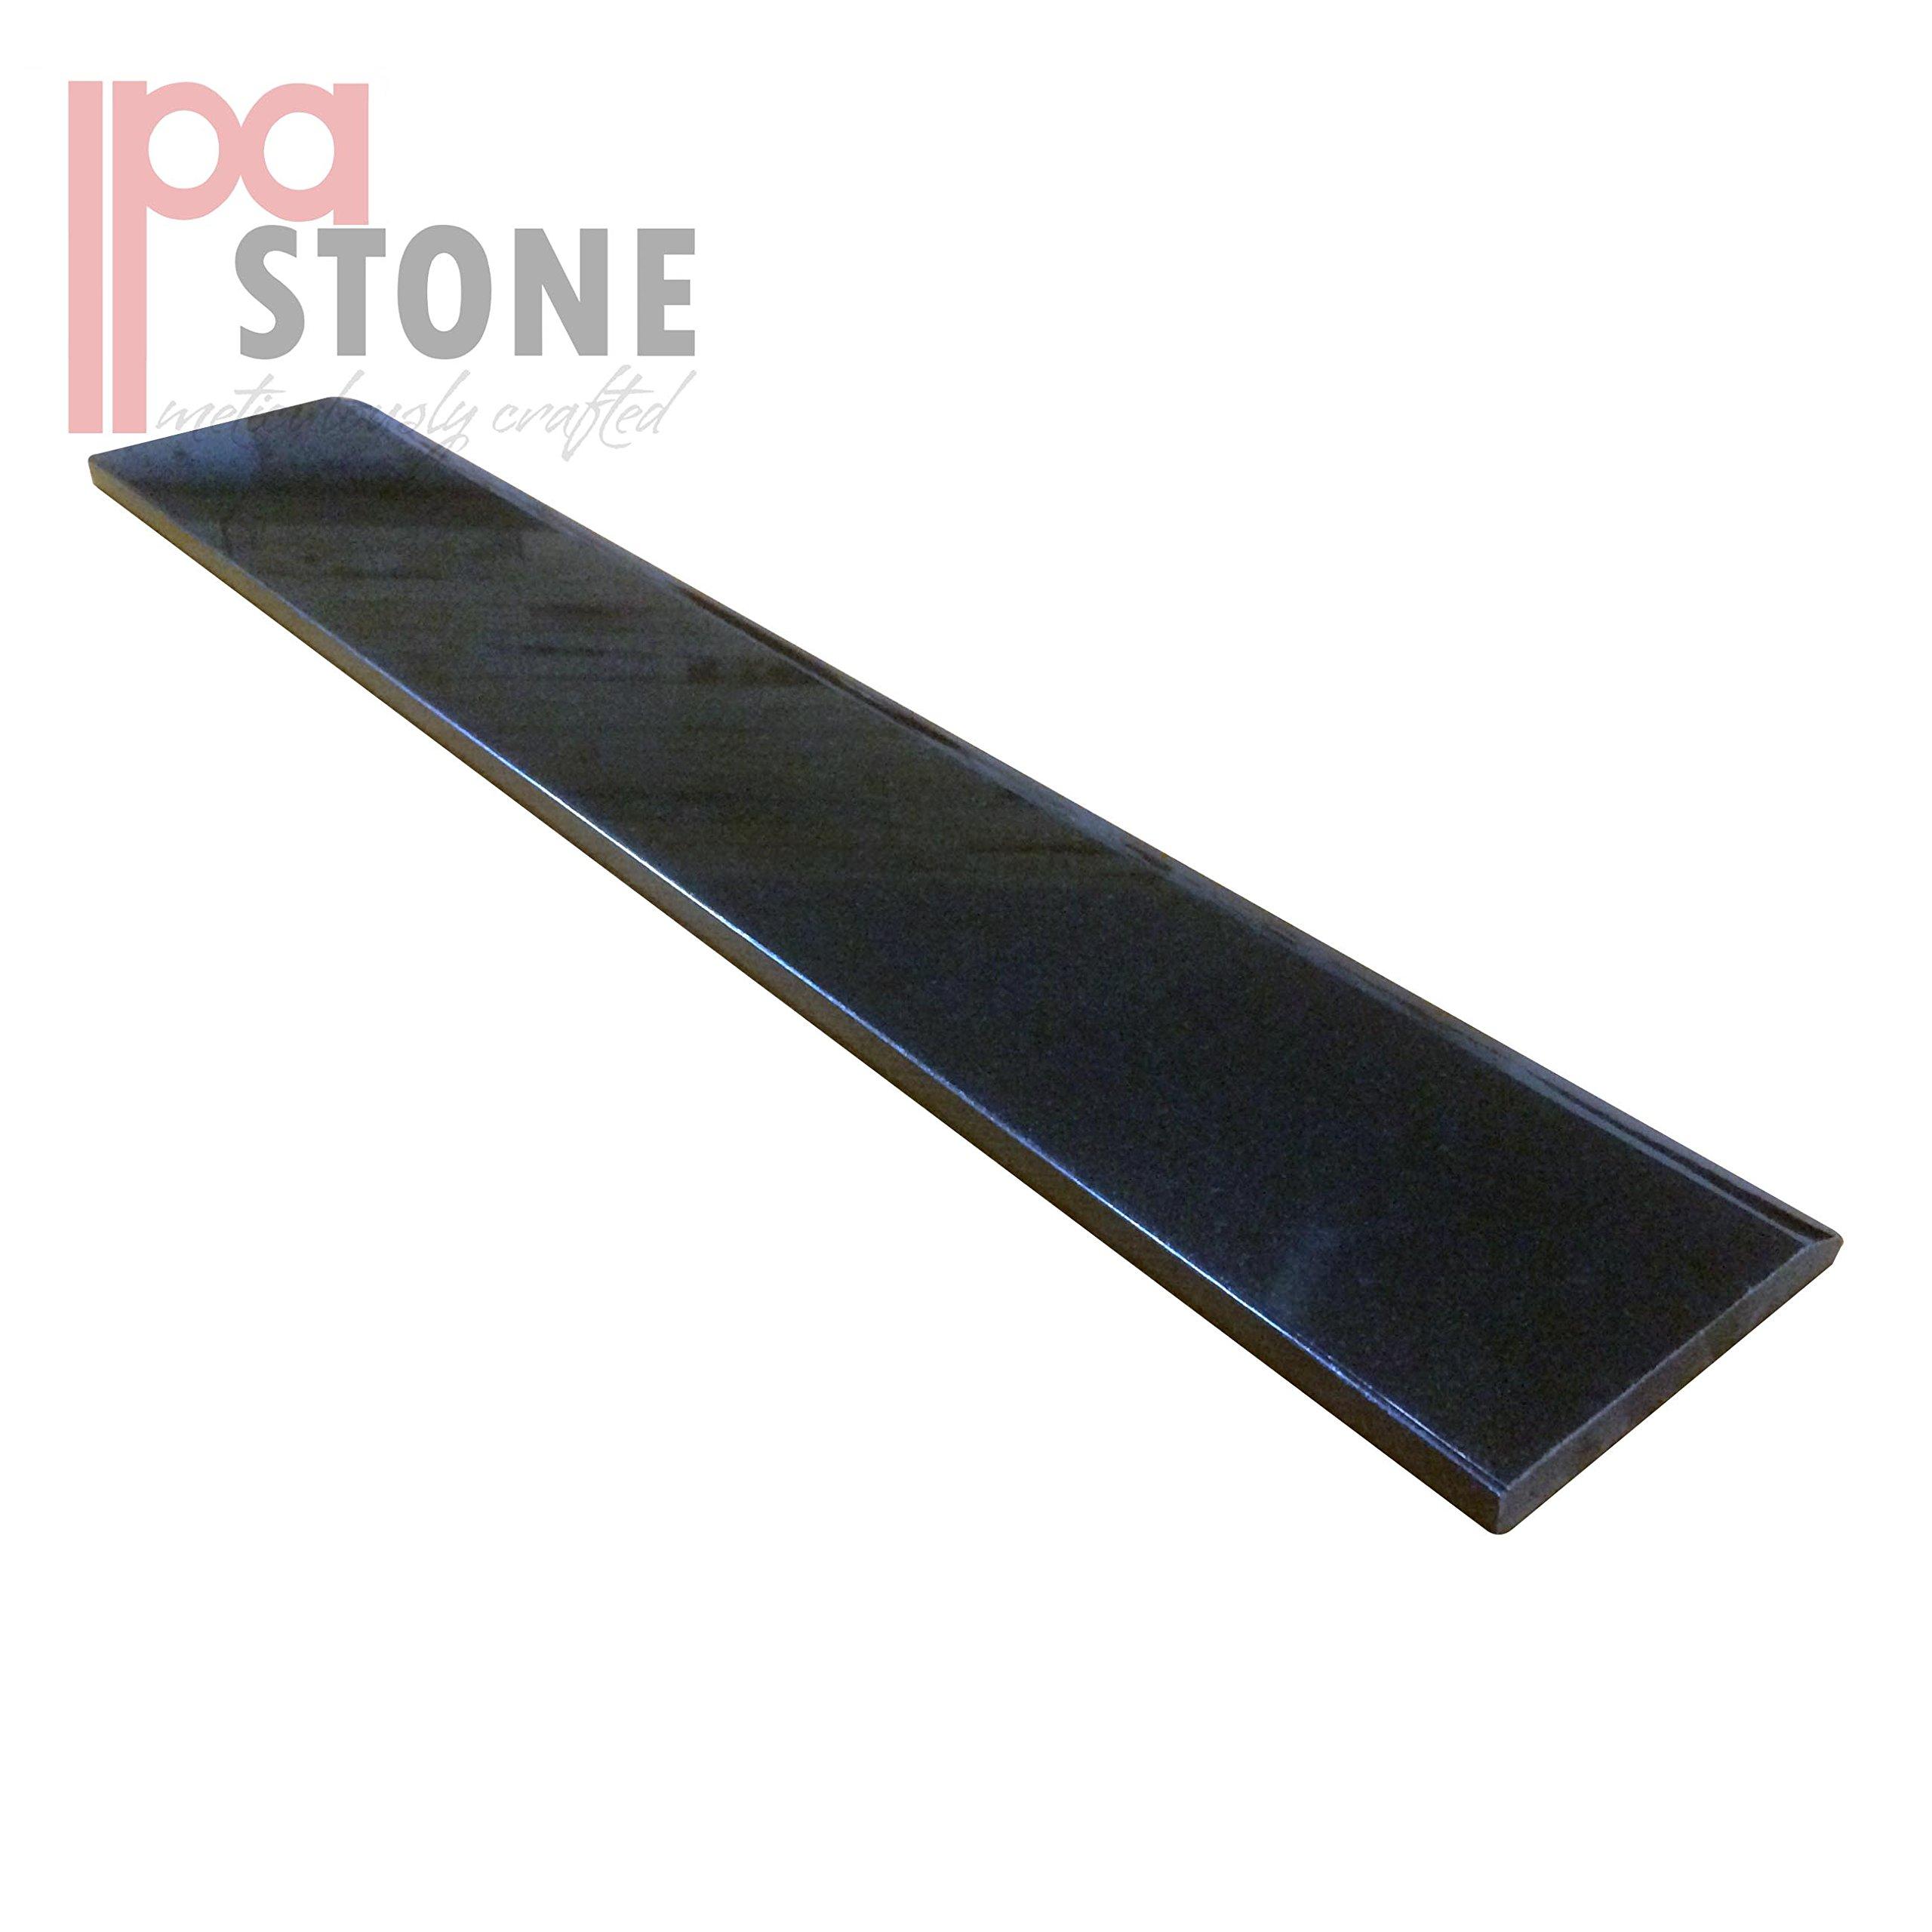 Single Hollywood Granite Door Saddle - Black Absolute Threshold - 36 x 6 Inch